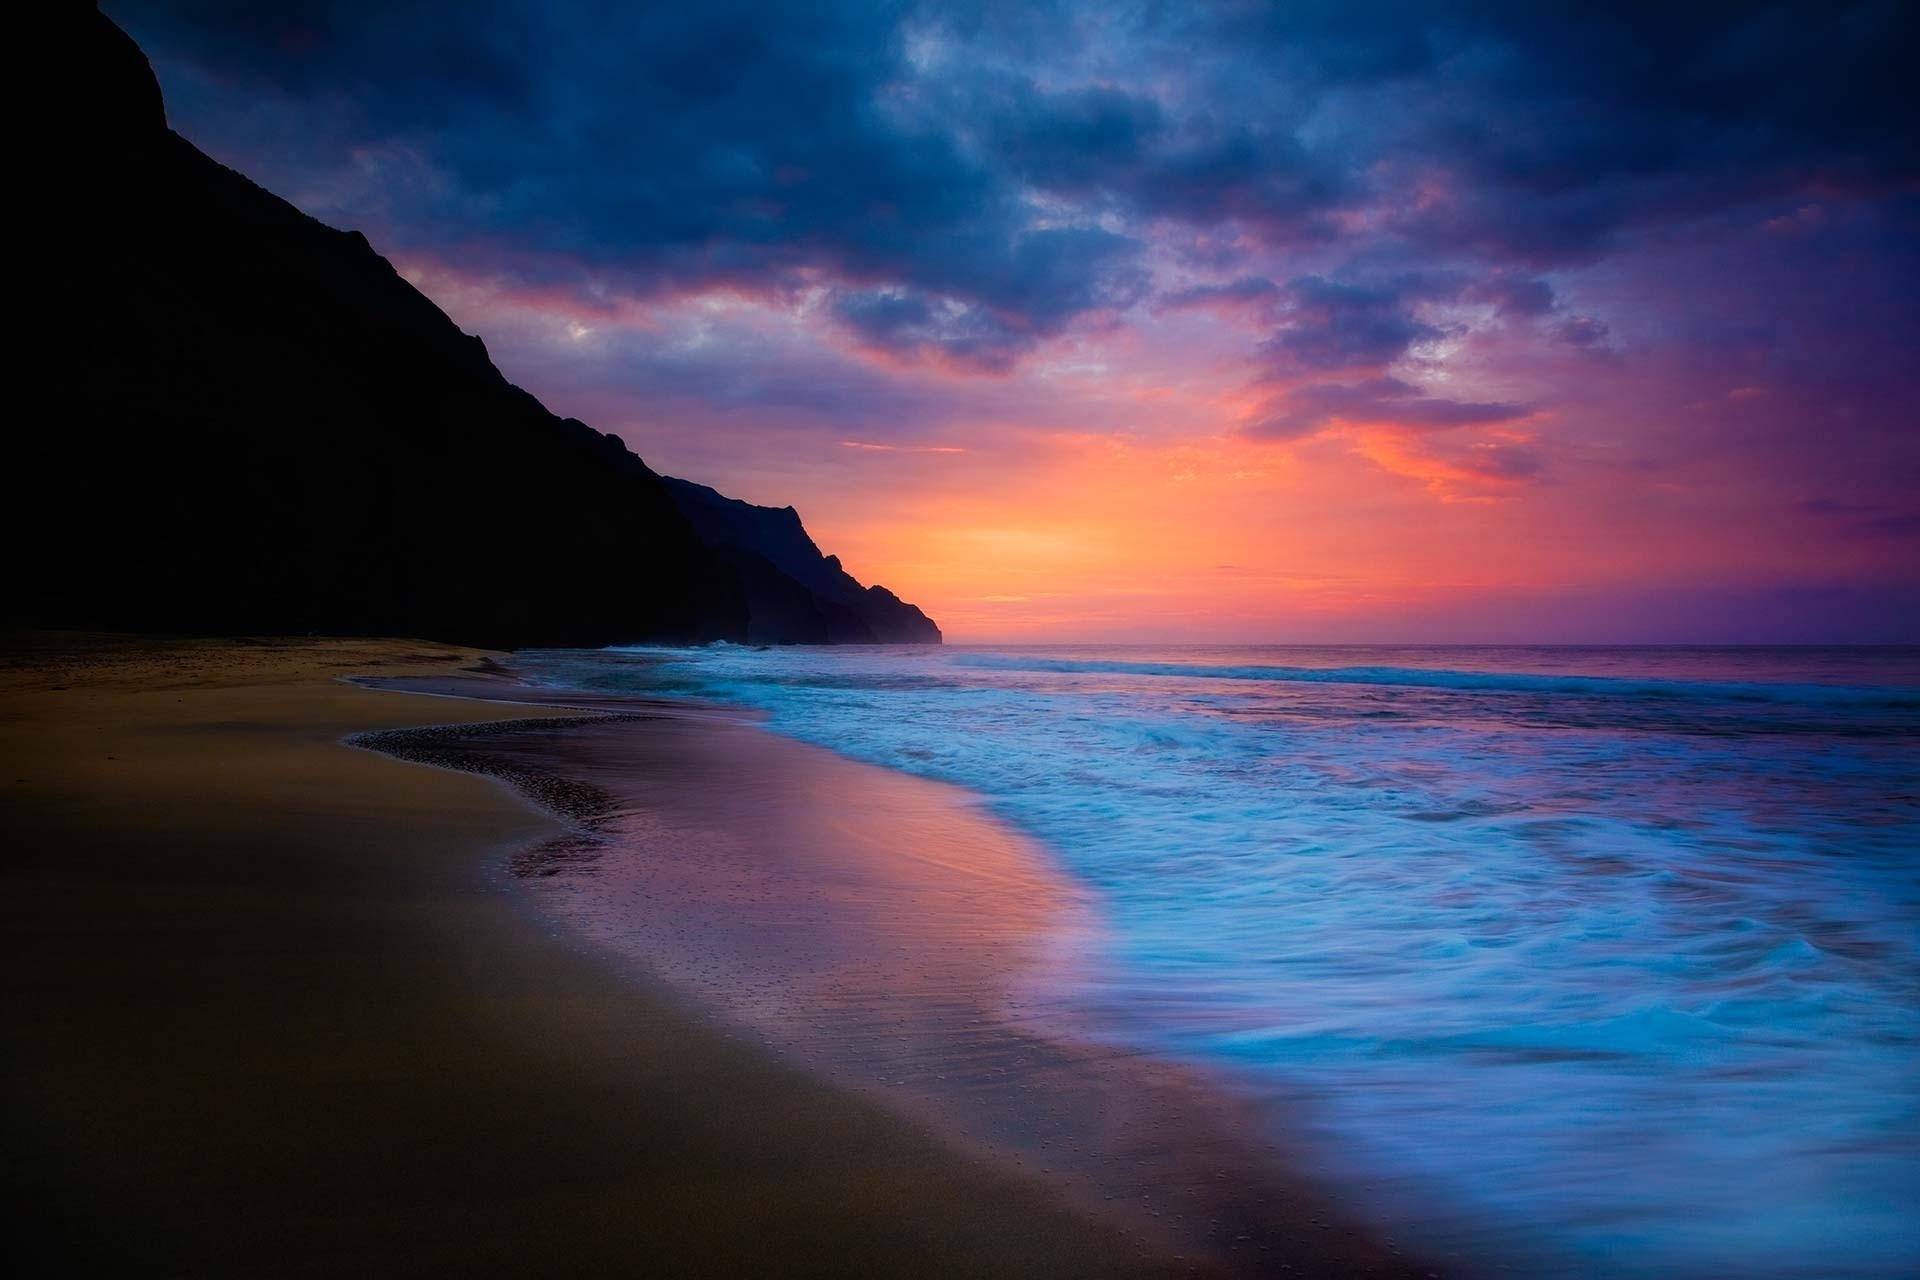 HD Movie Wallpaper | … Wallpaper sky waves beach desktop HD  Desktop Wallpapers